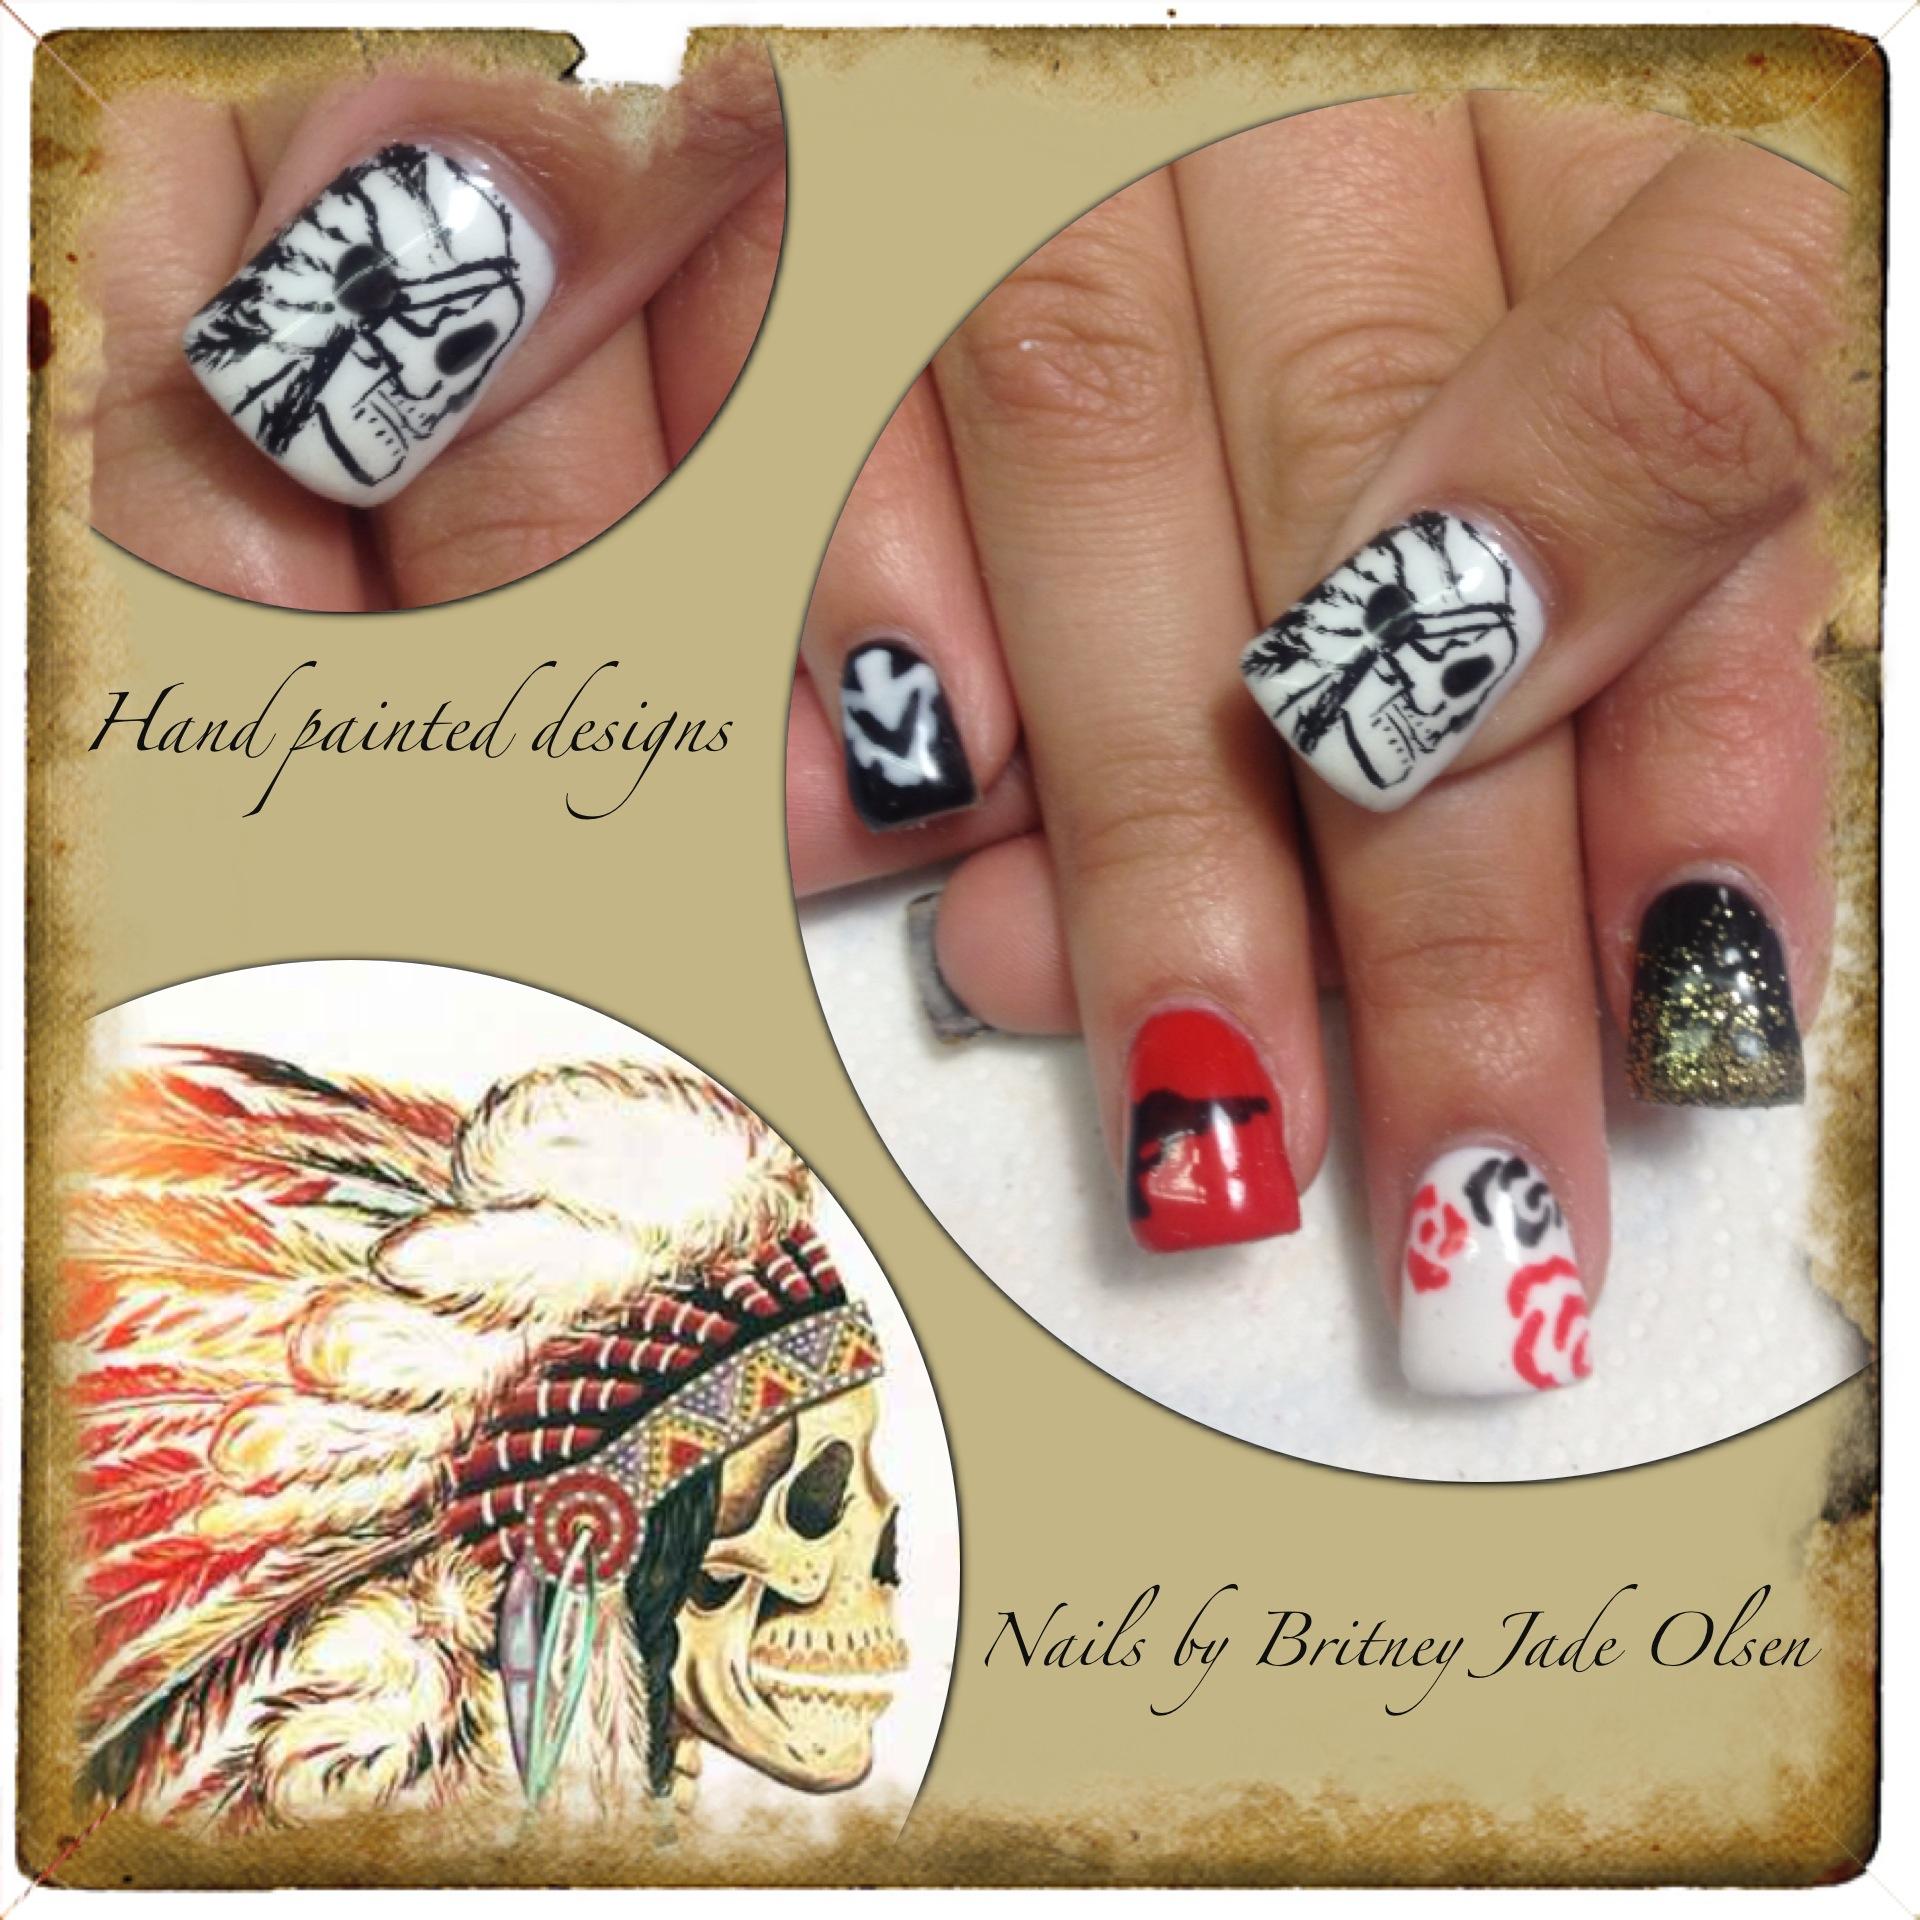 Drawn nail pinterest Hand painted american Nails theme